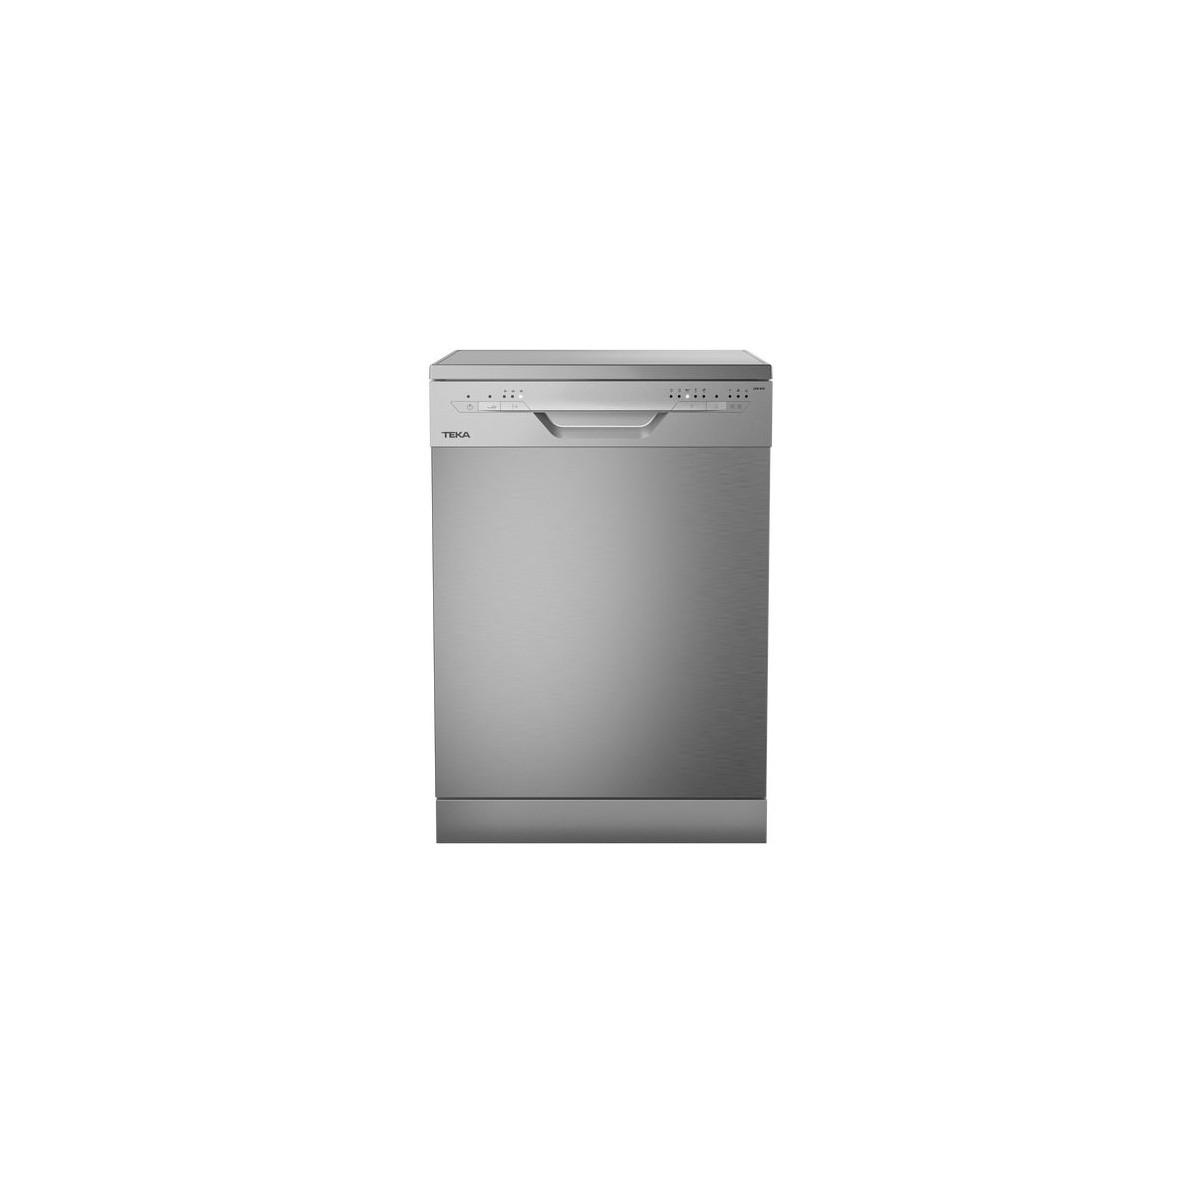 Lavavajillas Teka LP8810 inox 60cm clase A+